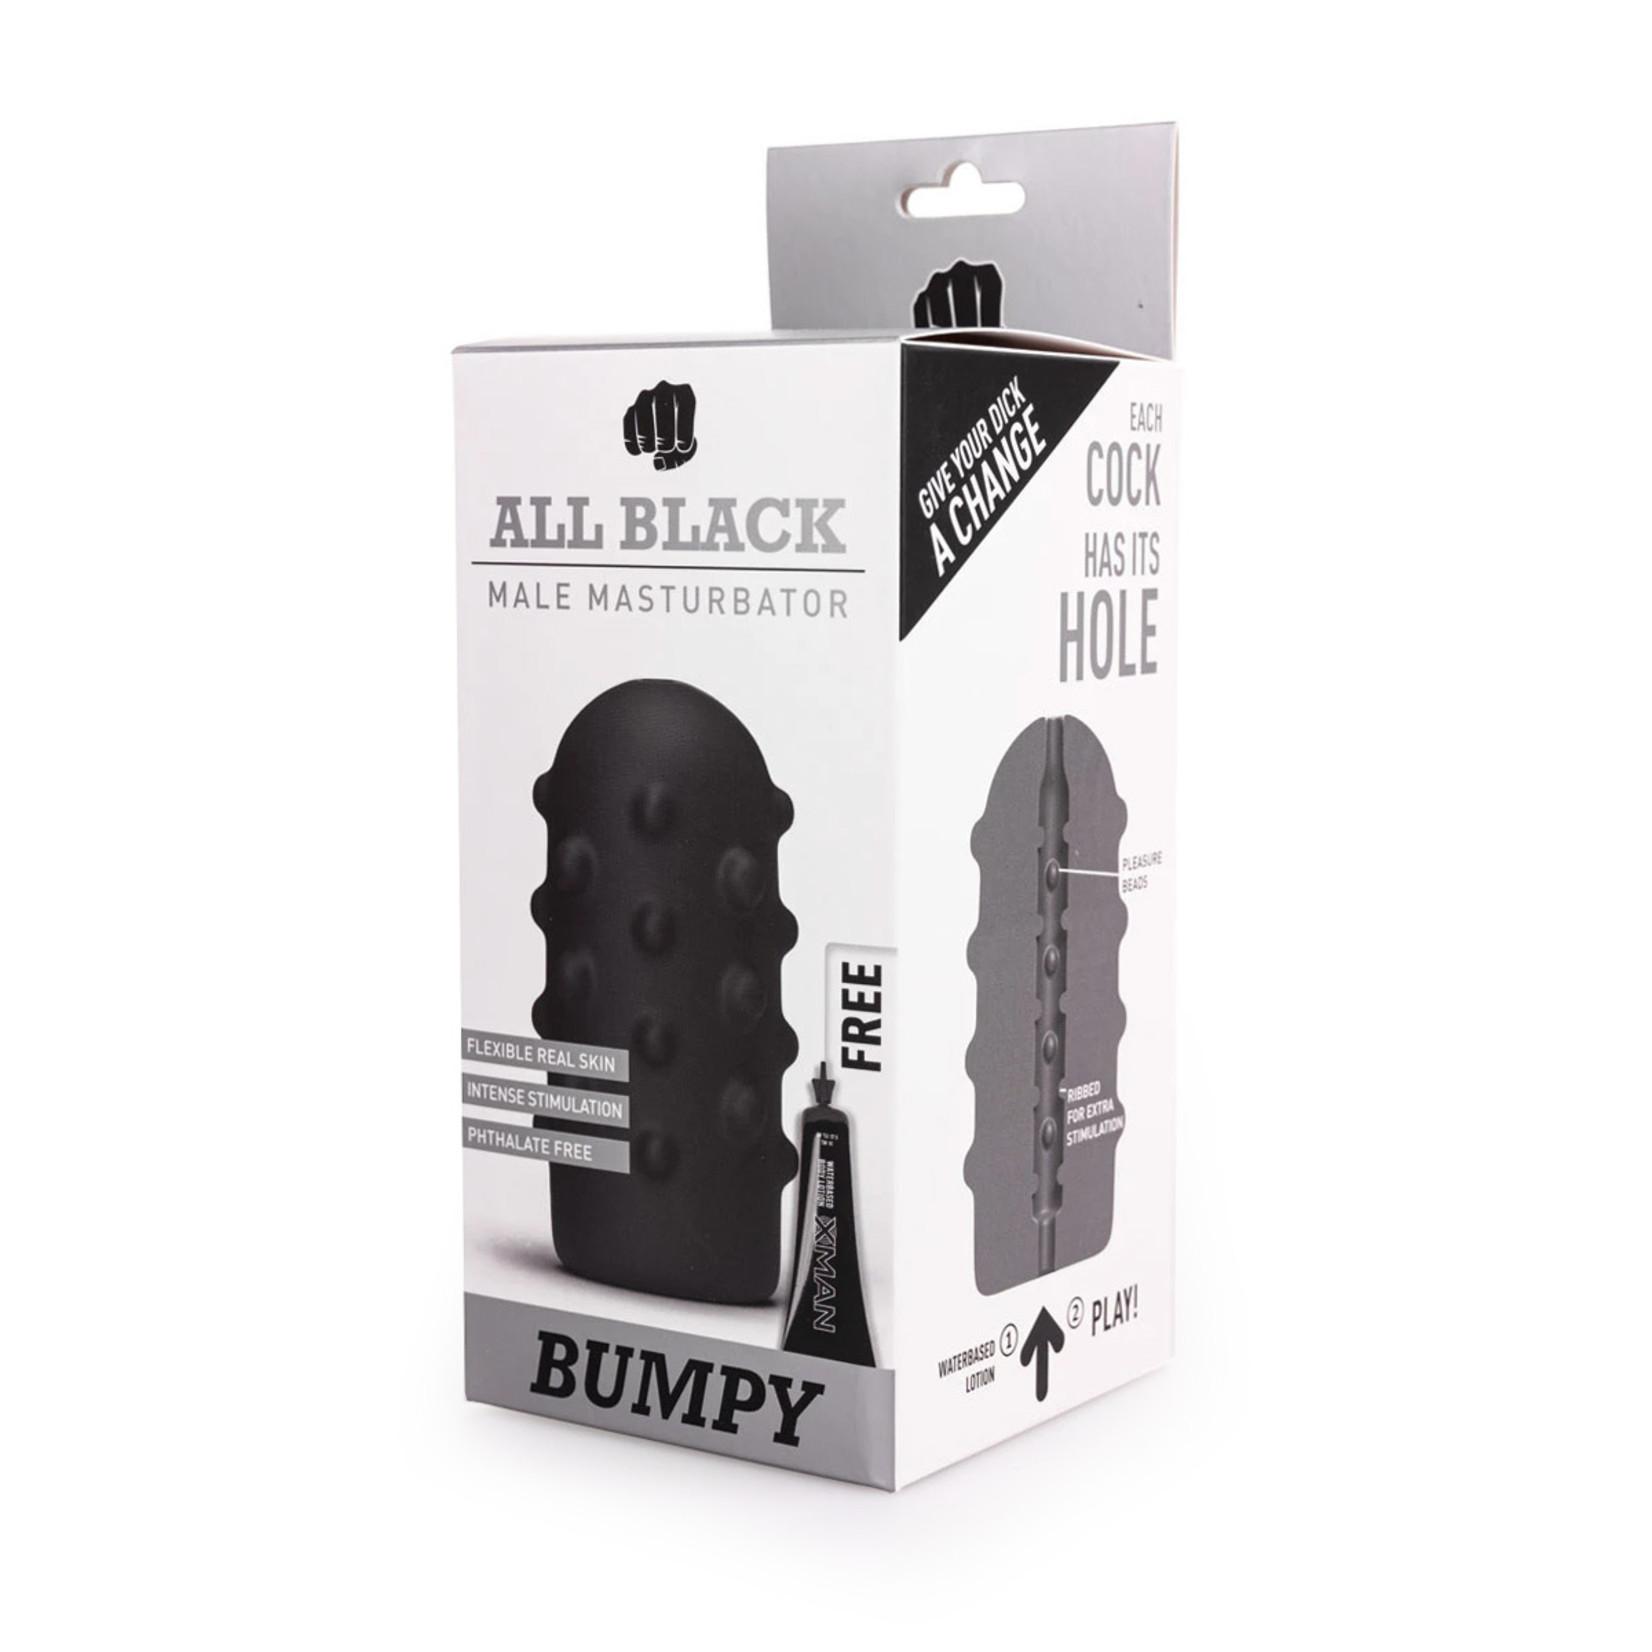 All Black Bumpy Masturbator